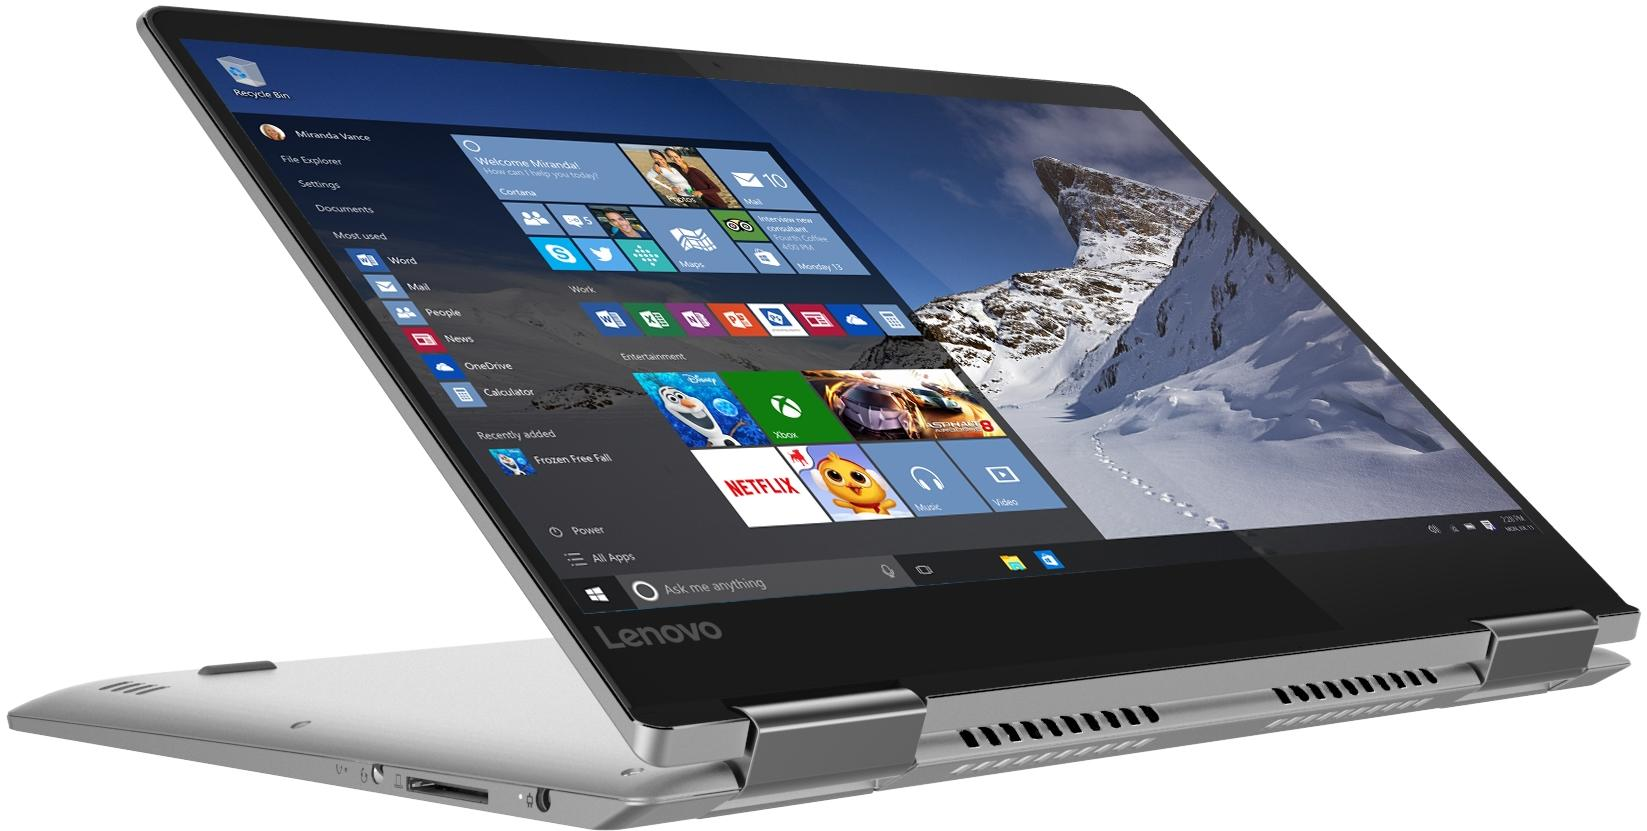 Lenovo unveils Yoga 710, Yoga 510, and Miix 310 mainstream ...